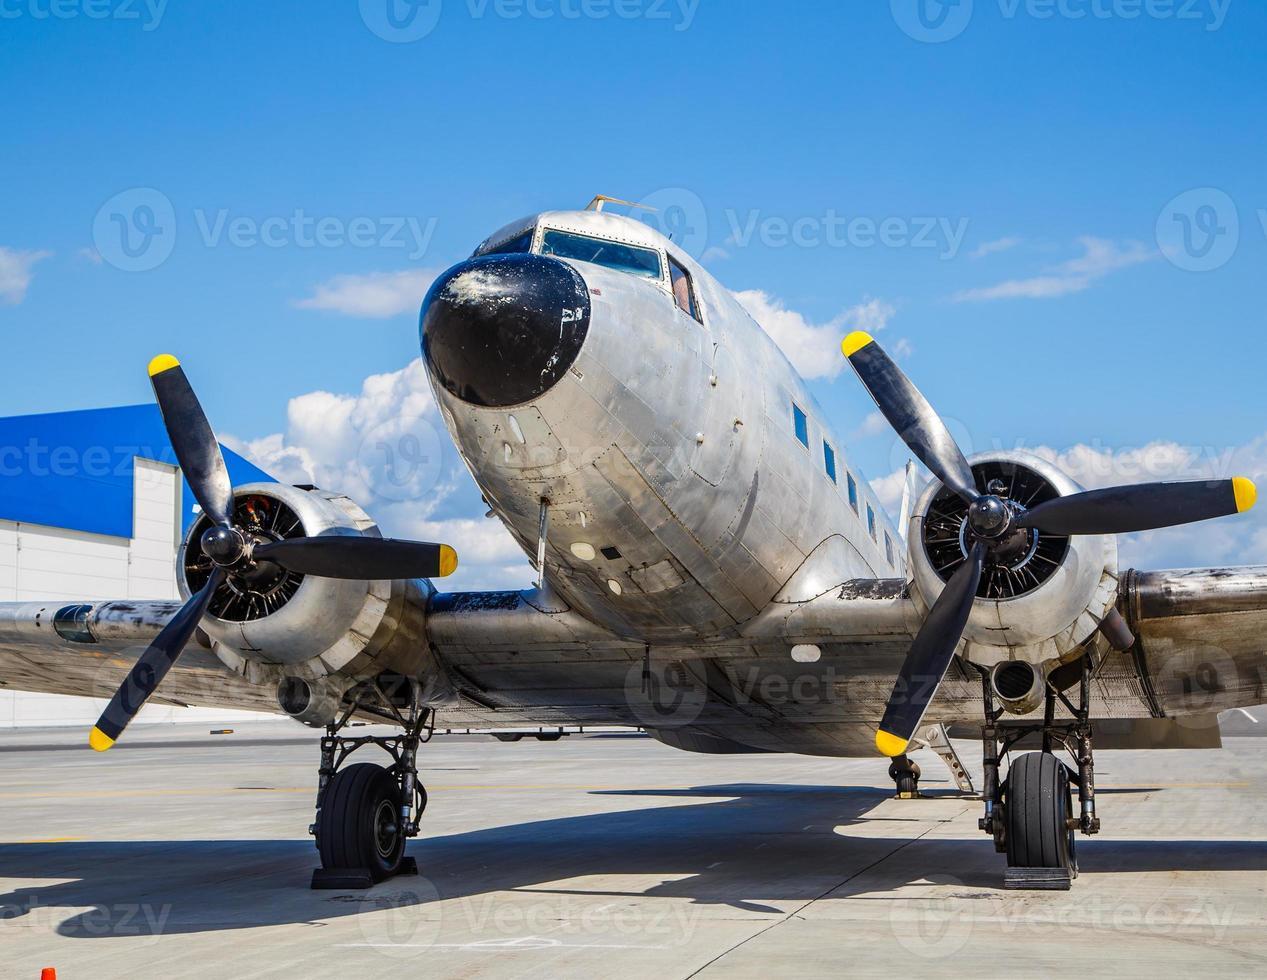 avião velho douglas 40s no aeroporto foto